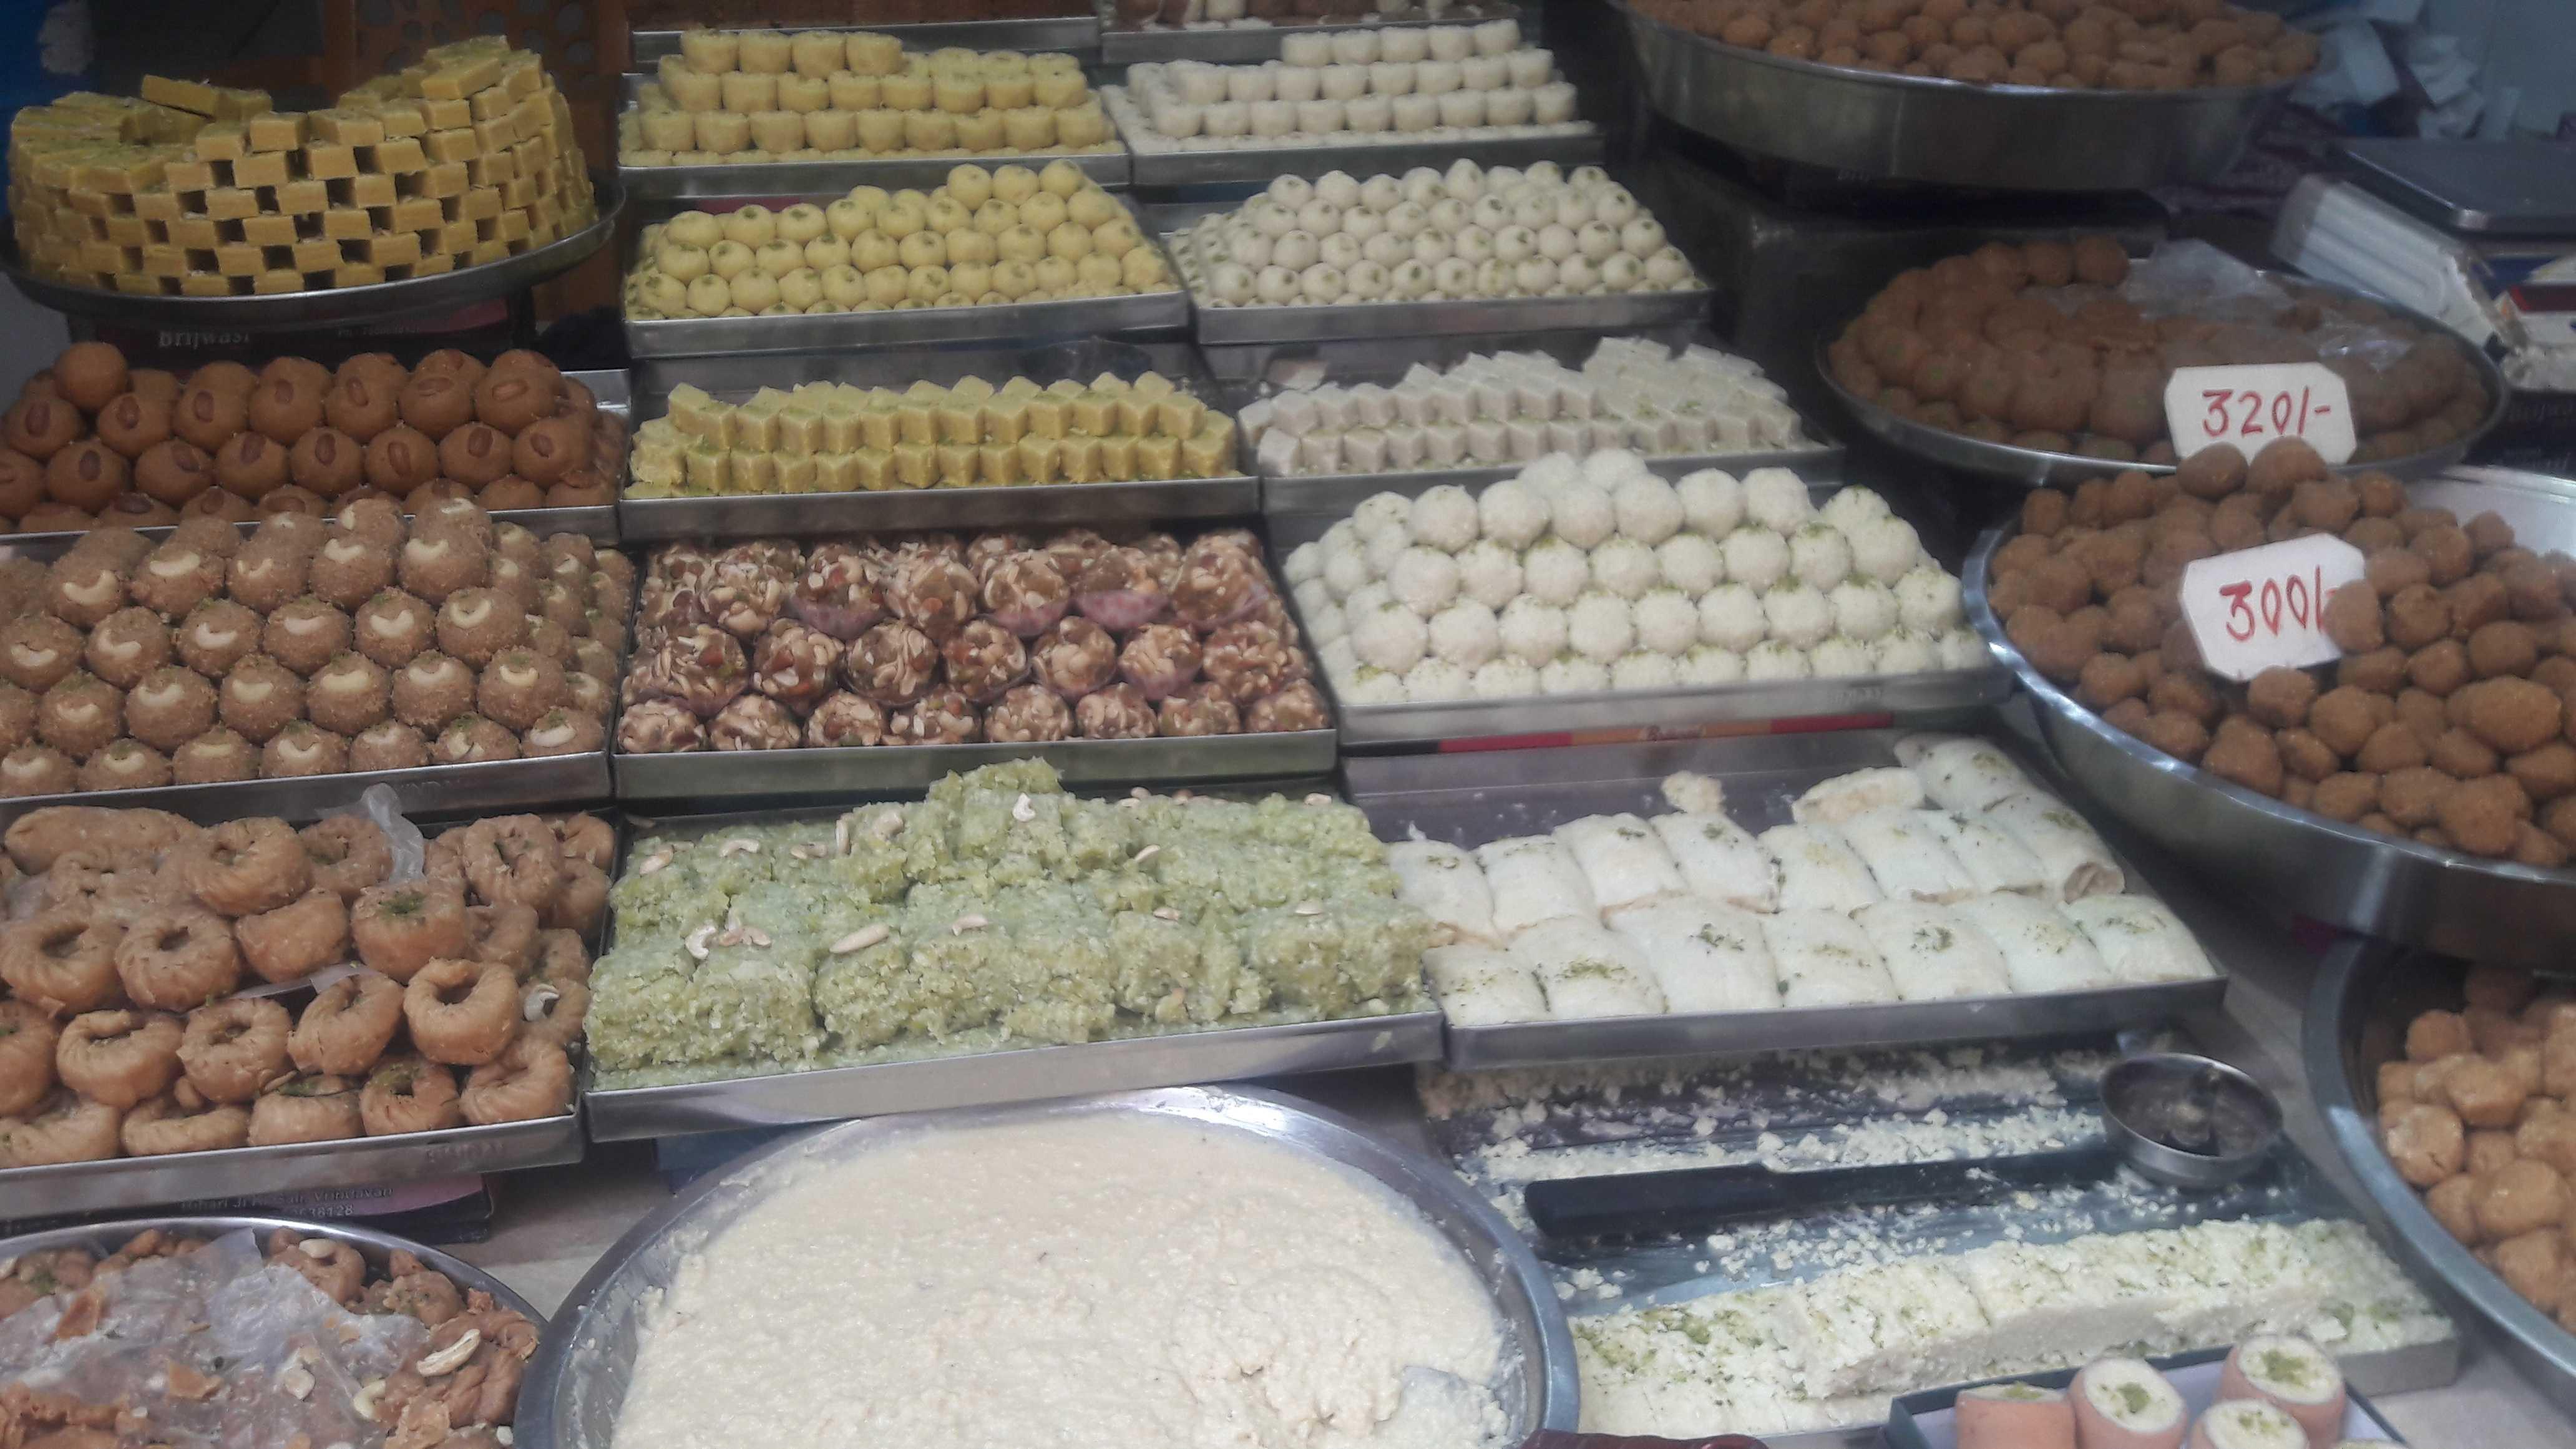 biquitous mithai shops every few steps-fnbworld